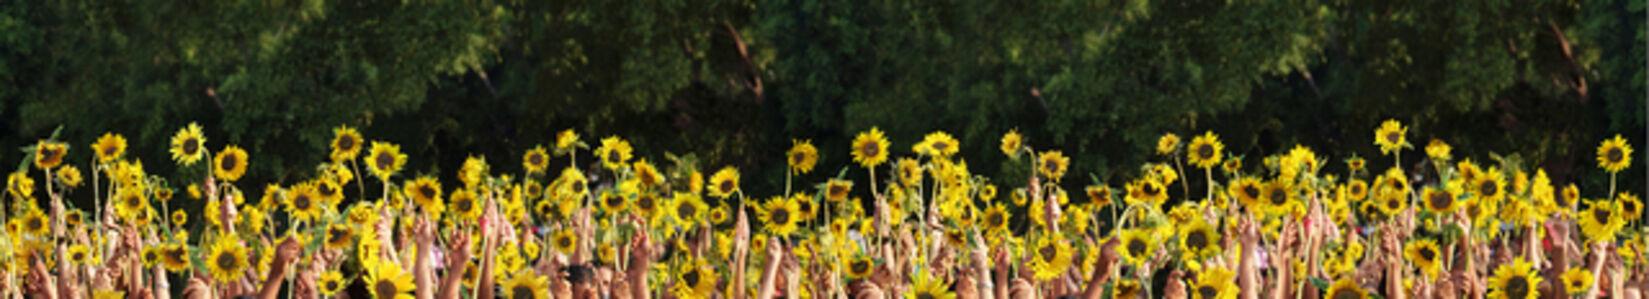 Untitled- Series Van Gogh Sunflowers